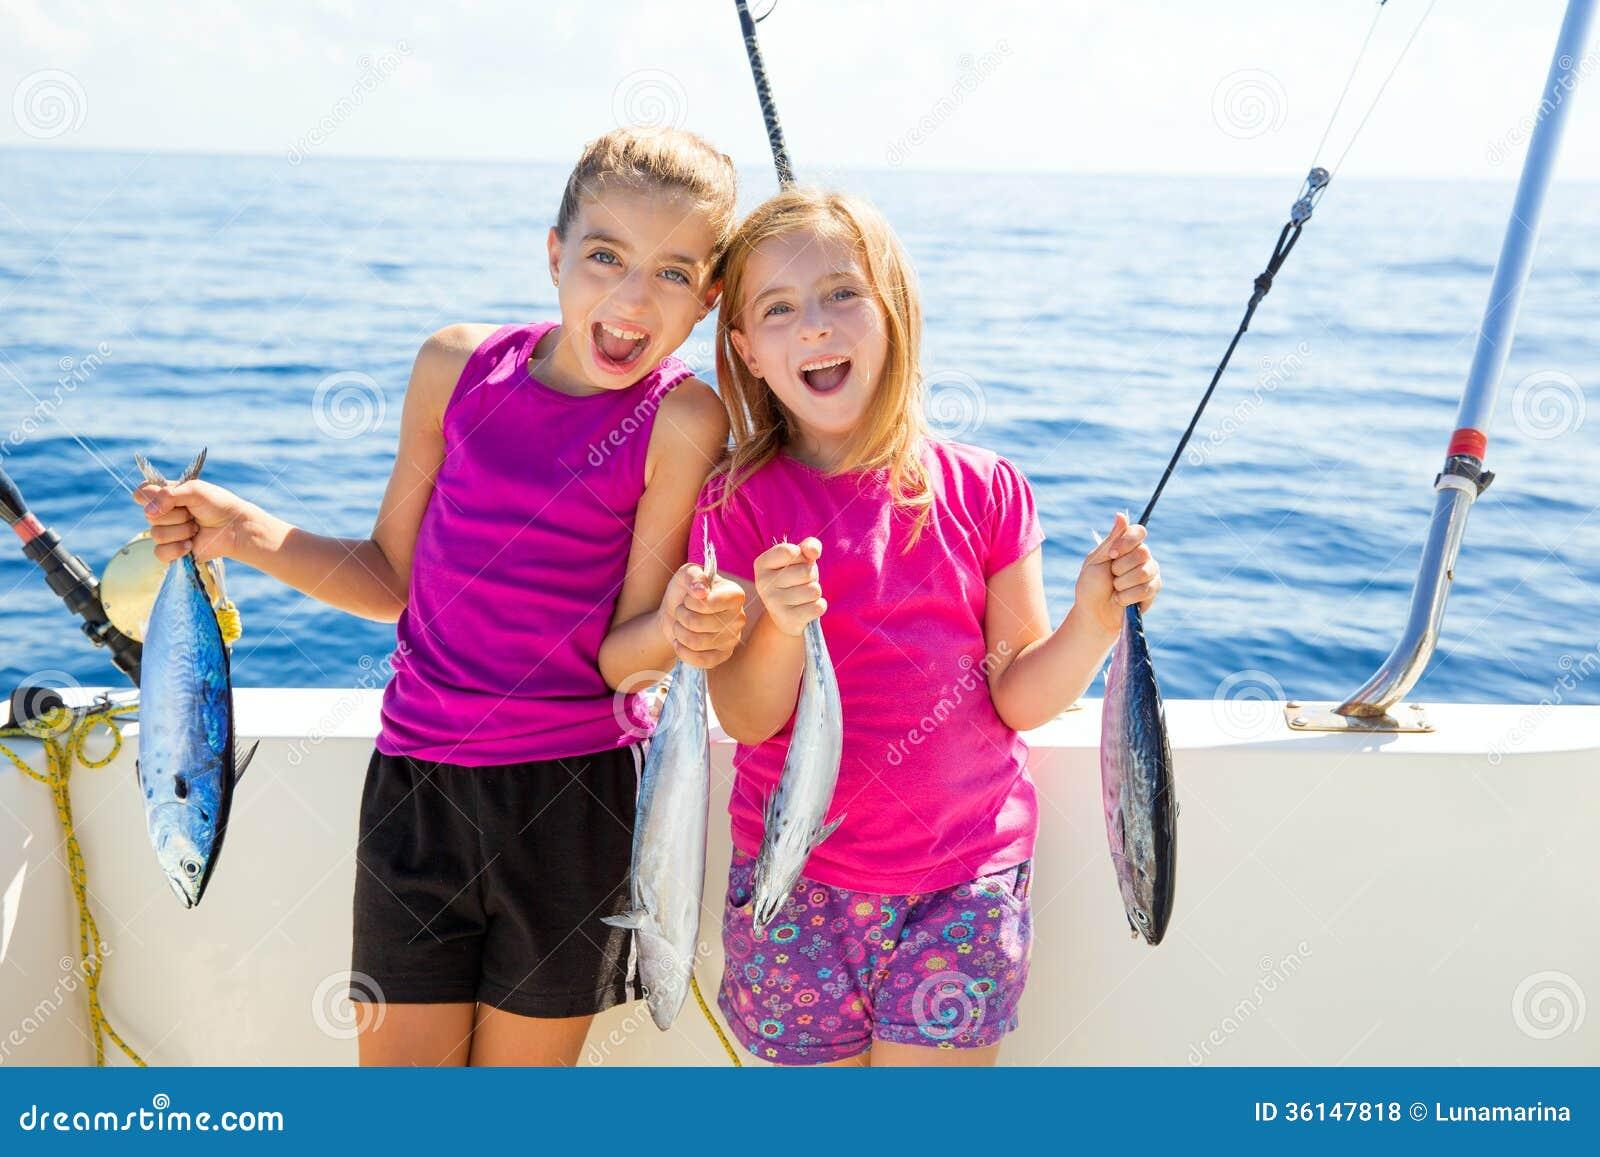 tunas girls Dream girl sportfishing, puntarenas, costa rica 1k likes owners: costa rican dreams, llc (ruste & sara jane via.